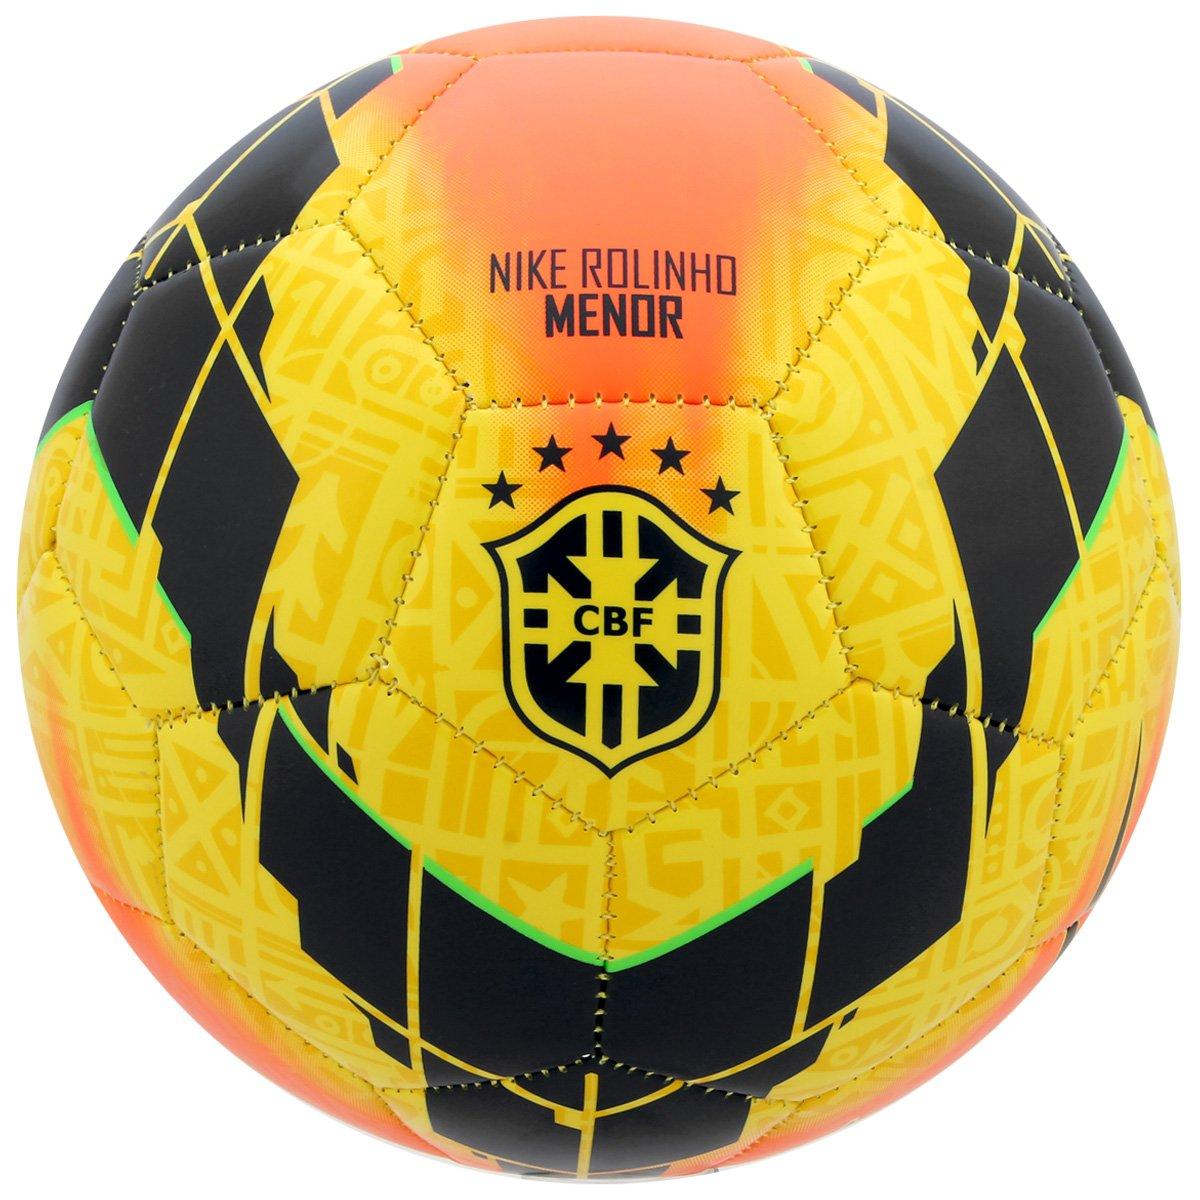 Bola Nike CBF Menor Futsal - Compre Agora  c33552aa04d61